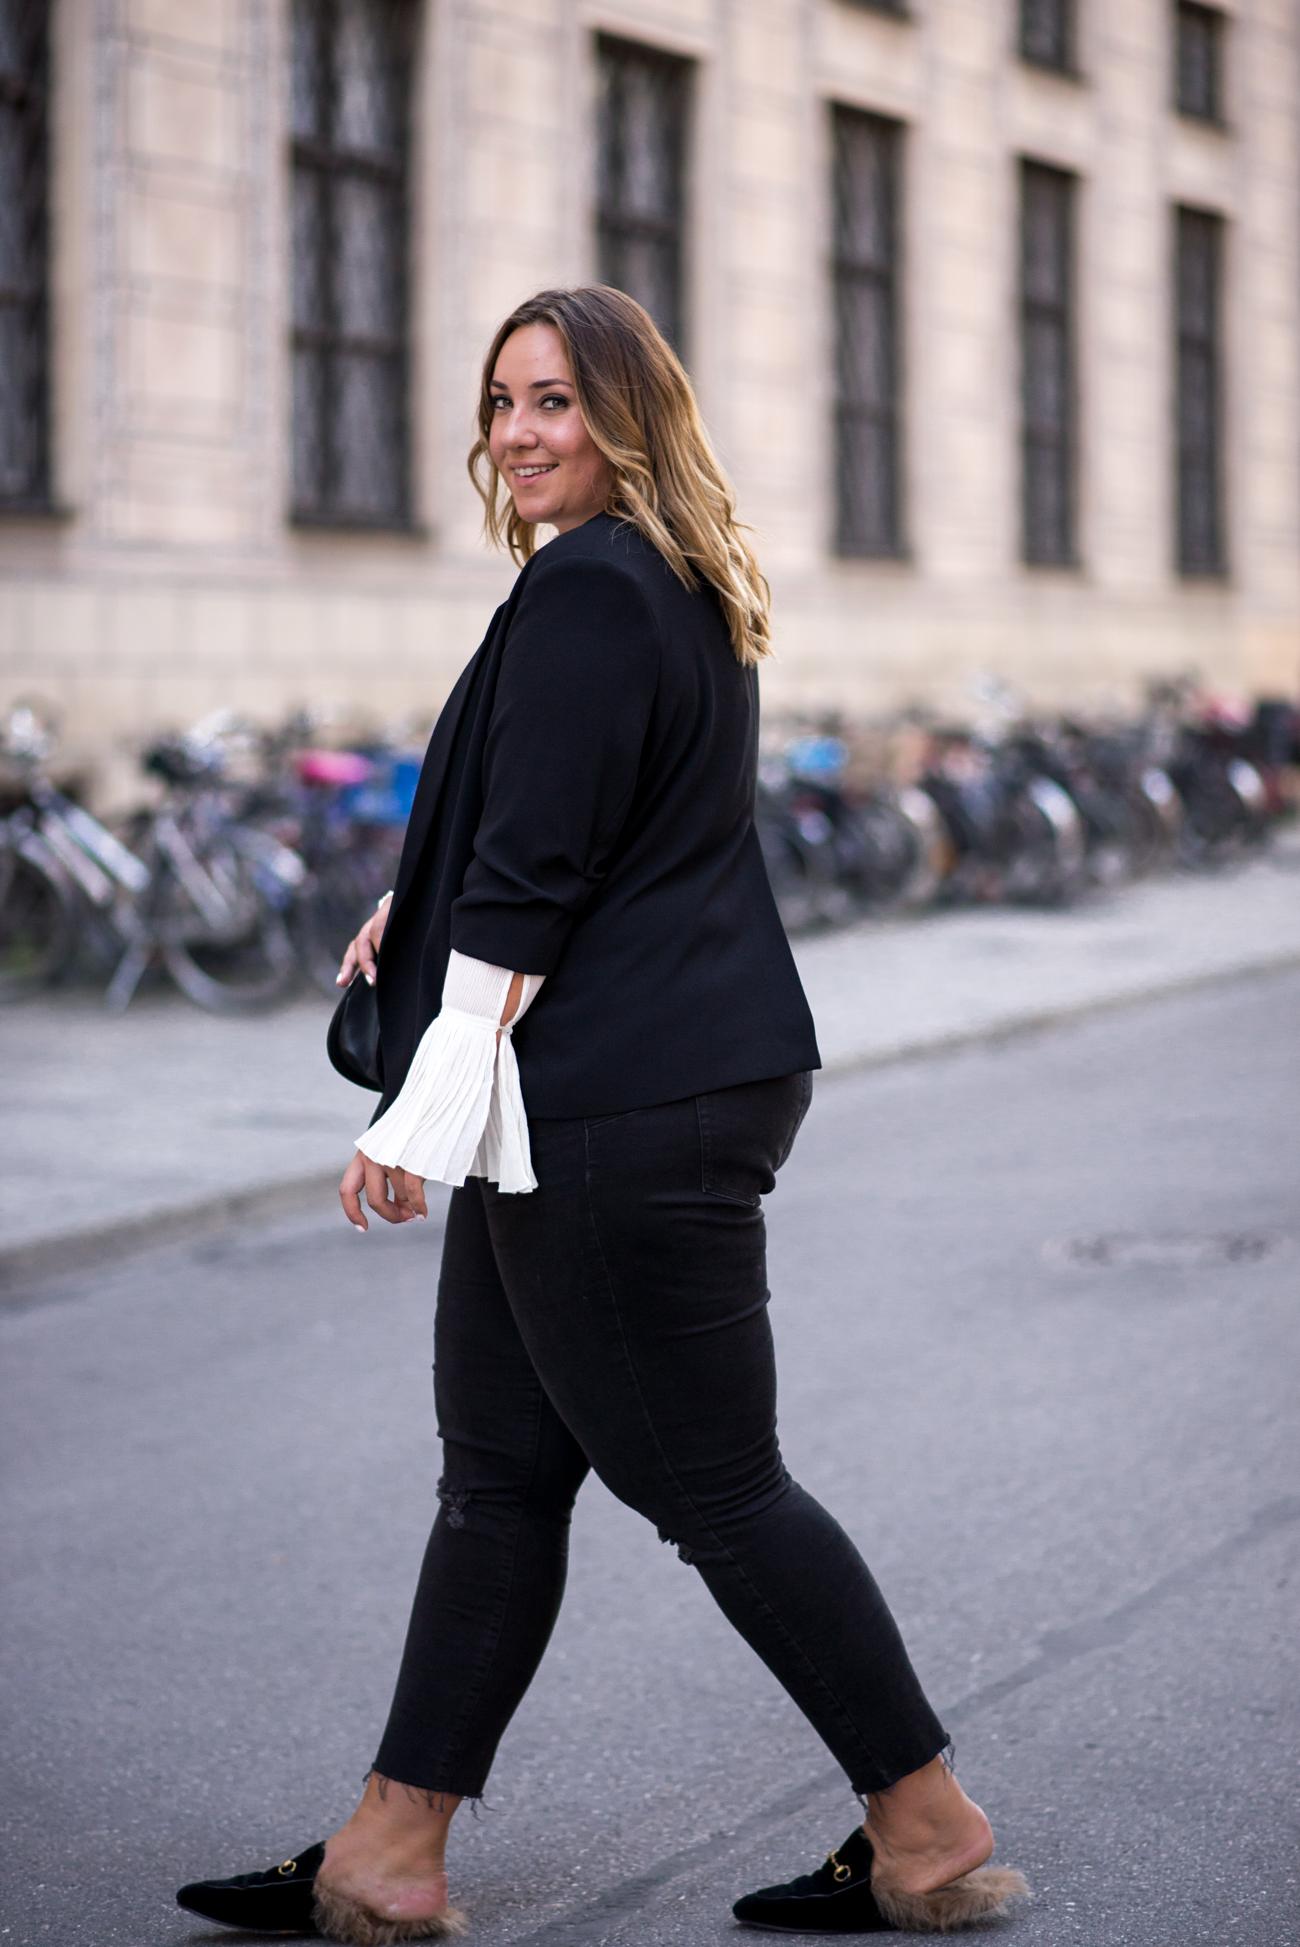 gucci-slipper_gucci-princetown_skinny-and-the-curvy-one_plus_plus-size-blogger_fashion_blogger-deutschland_fashionblogger-munich_curve-16-von-21